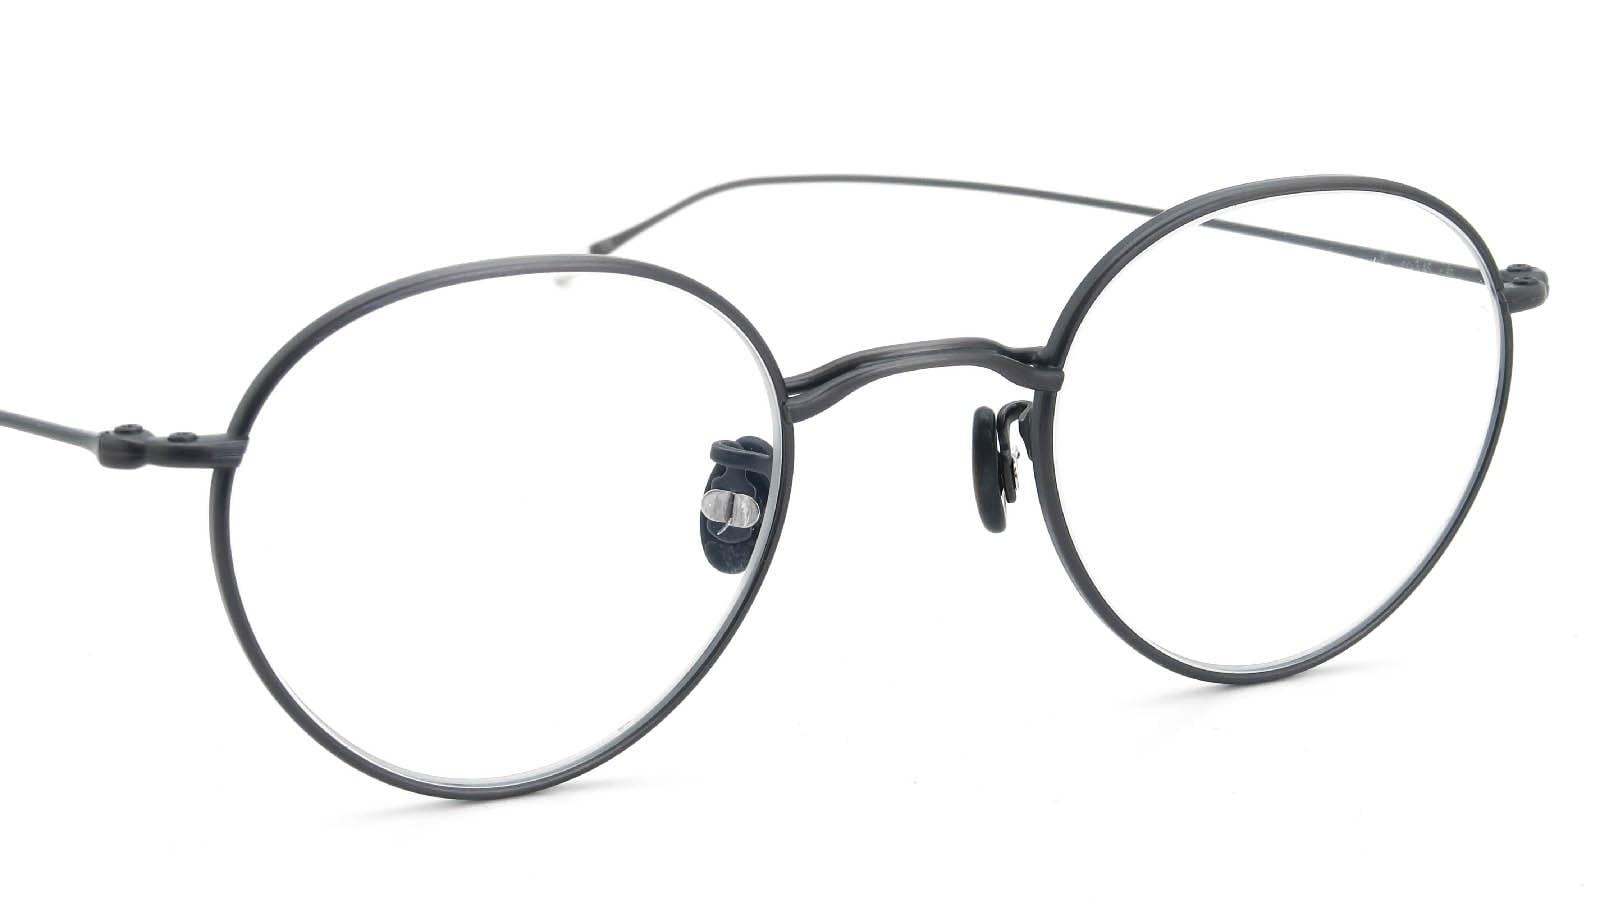 10 eyevan NO.3 45size 8S-CL MatCharcoal 6